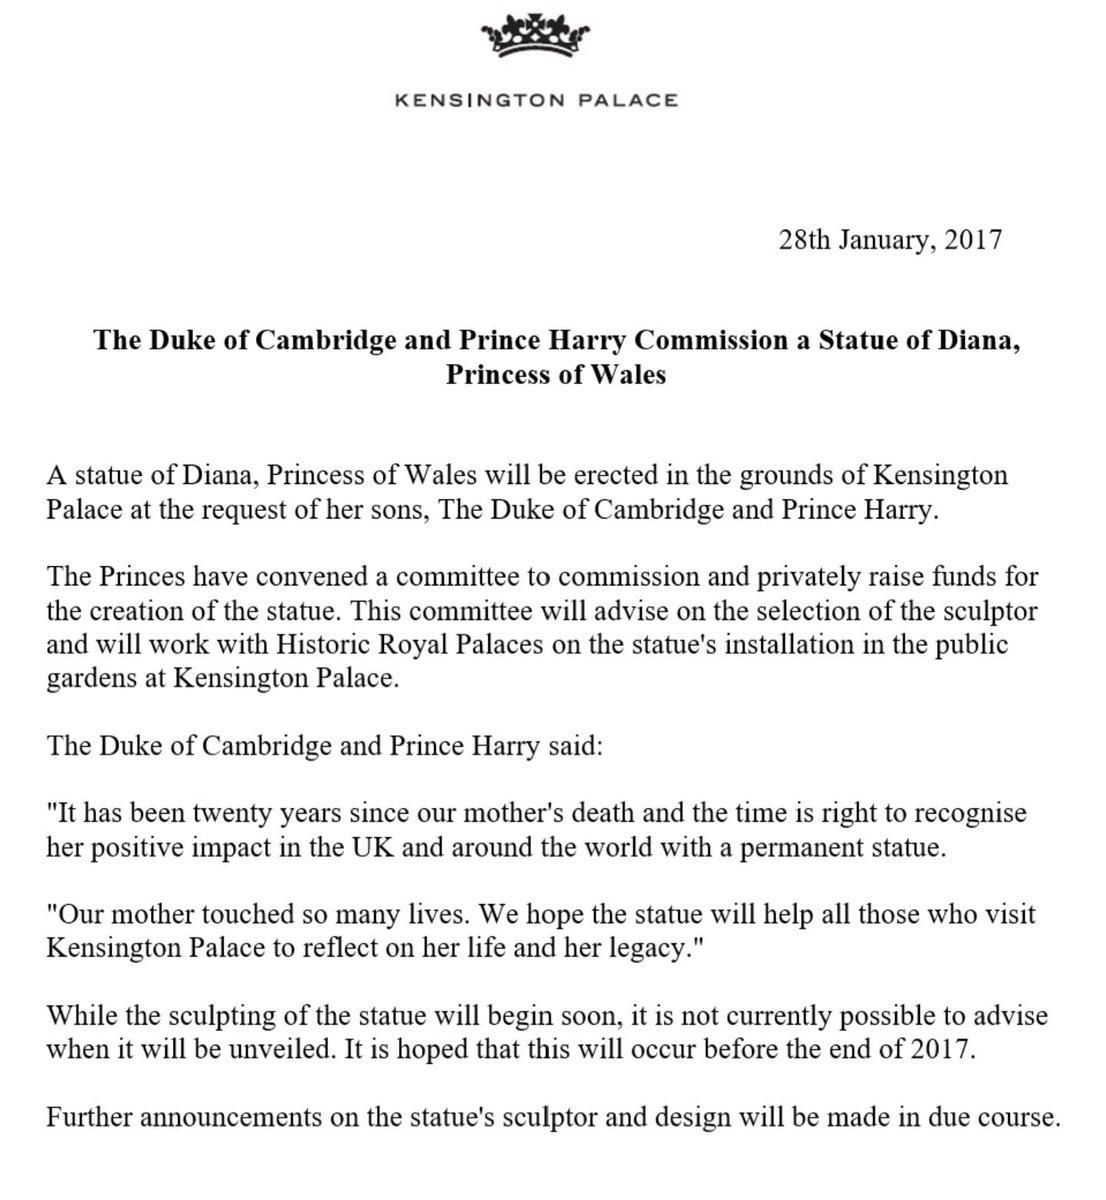 A Statue of Princess Diana Will Be Erected at Kensington Palace